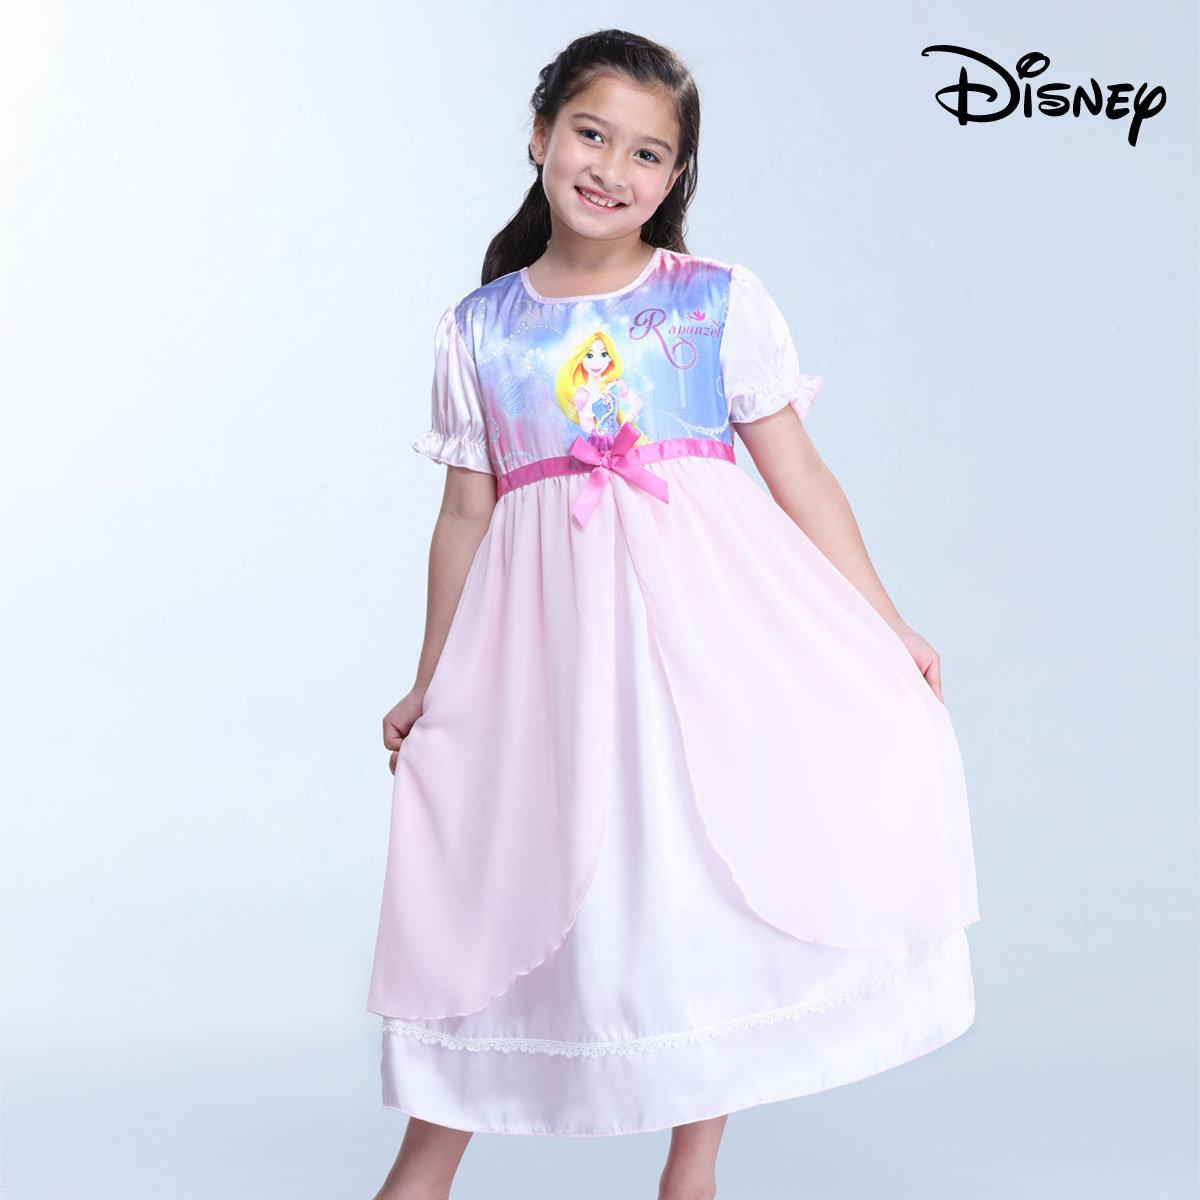 迪士尼 | Princess Girls Nightgown (Rapunzel) | HKTVmall Online Shopping